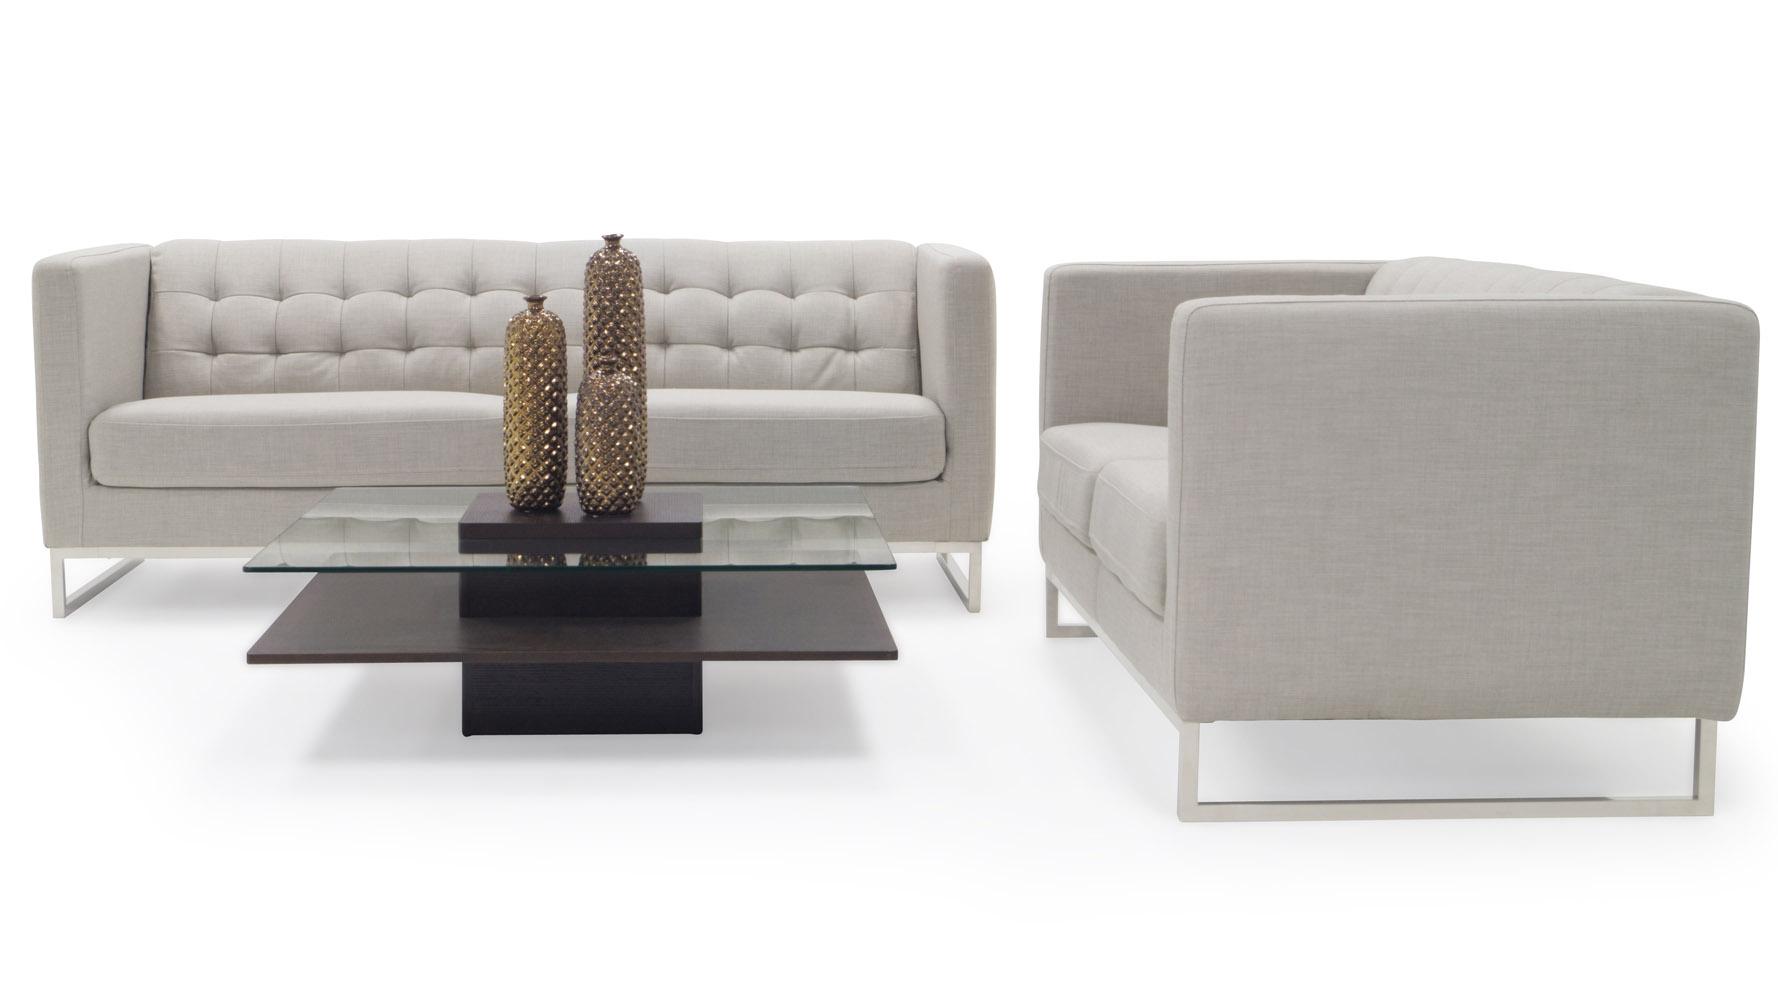 Alpha 3+2 Sofa Set - Cream | Zuri Furniture